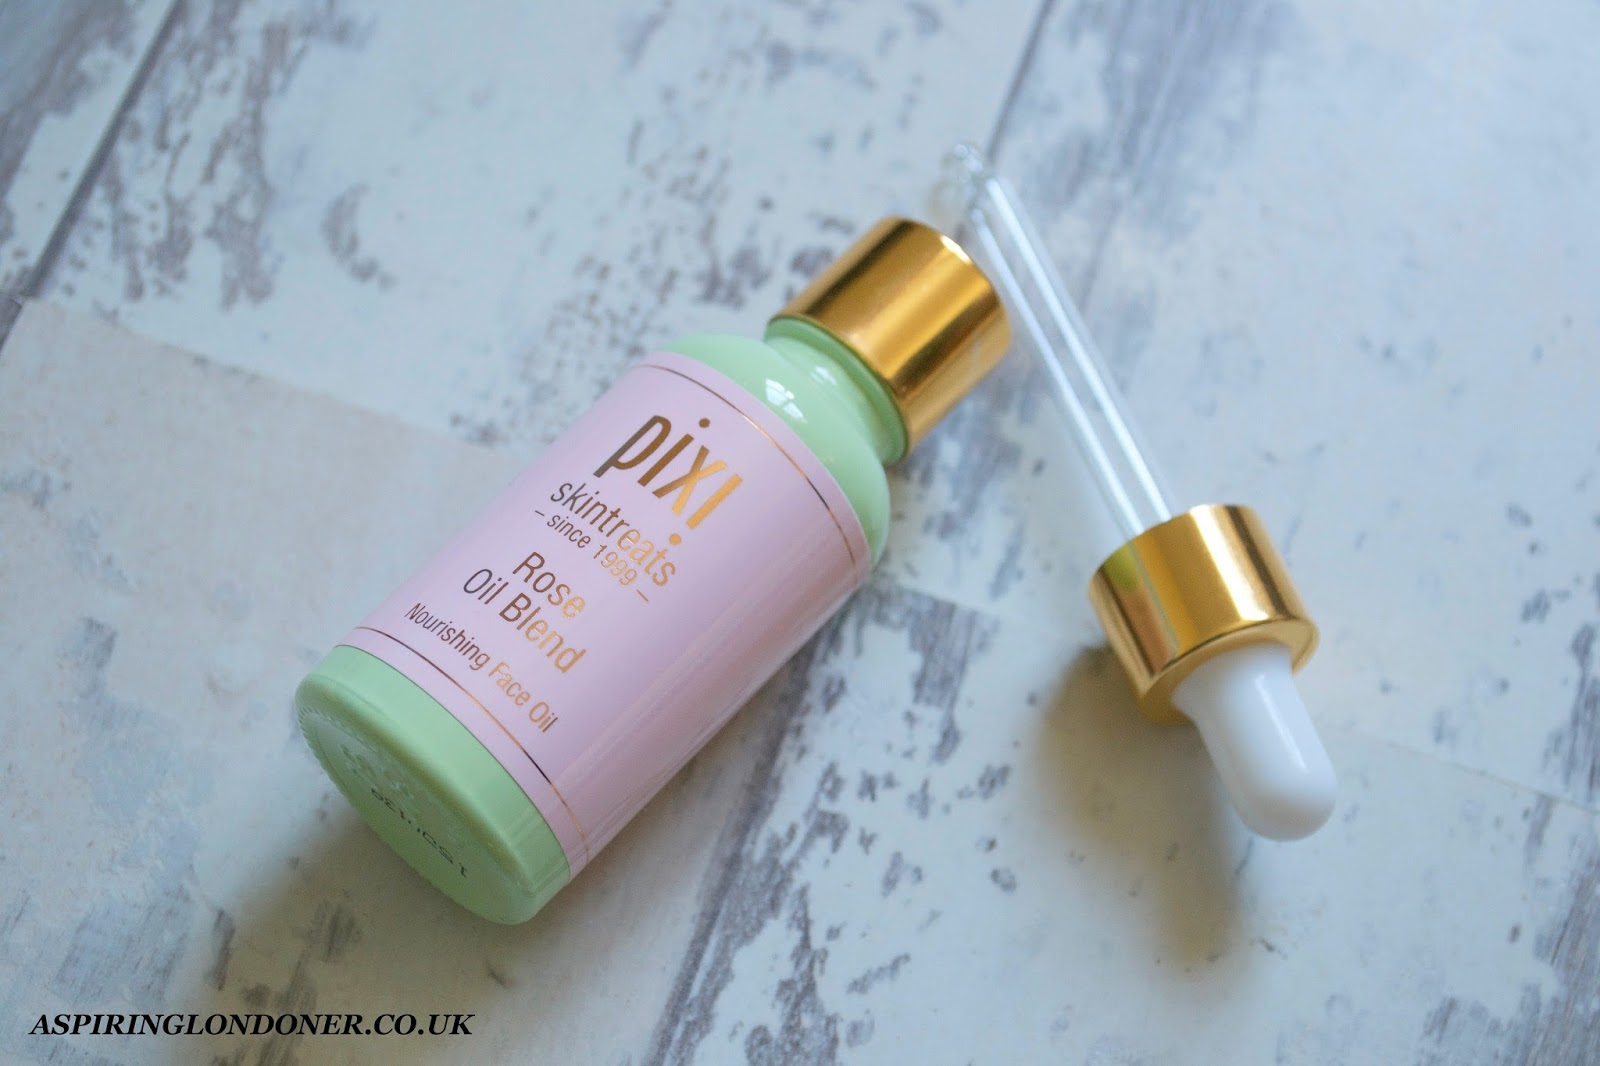 Pixi Rose Oil Blend - Aspiring Londoner